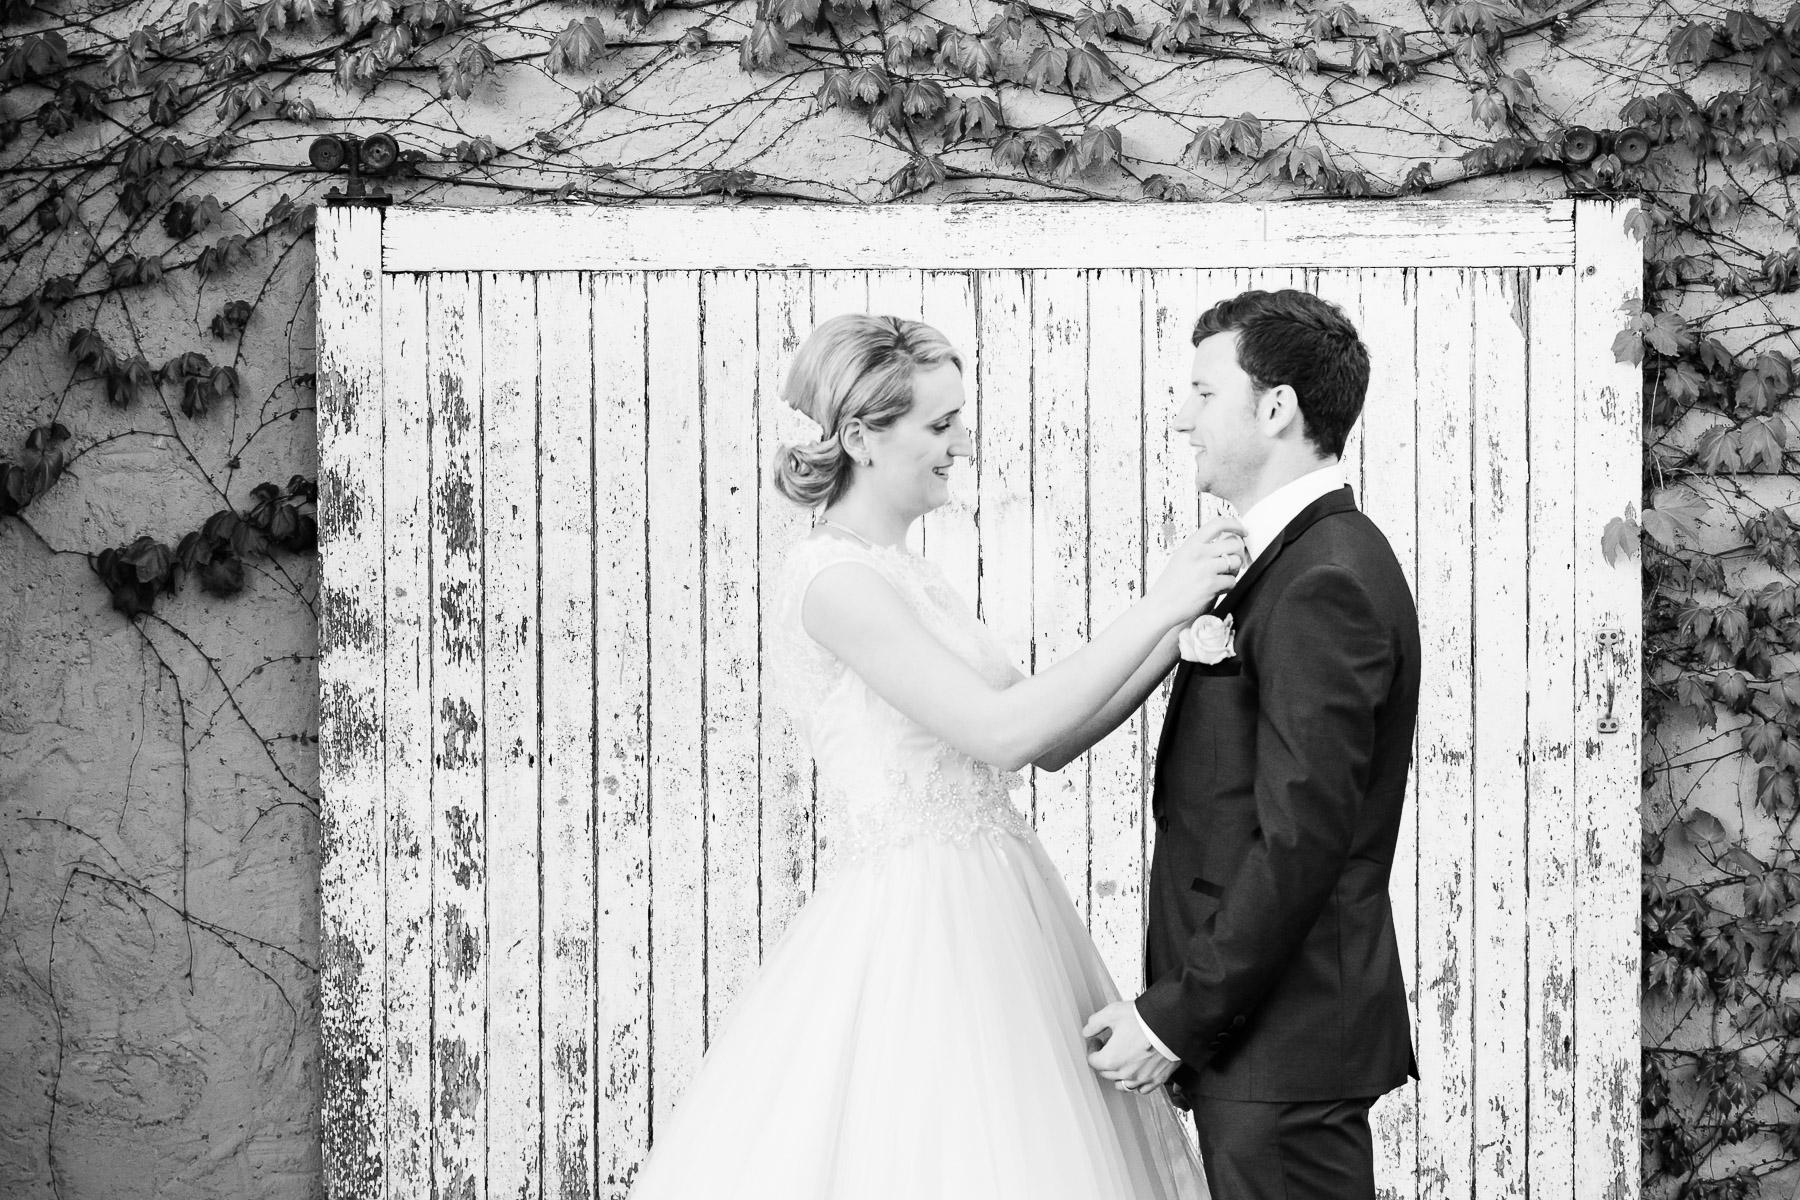 Marnie_and_Charlie_Yarra_Valley_Wedding_Blog-79.jpg